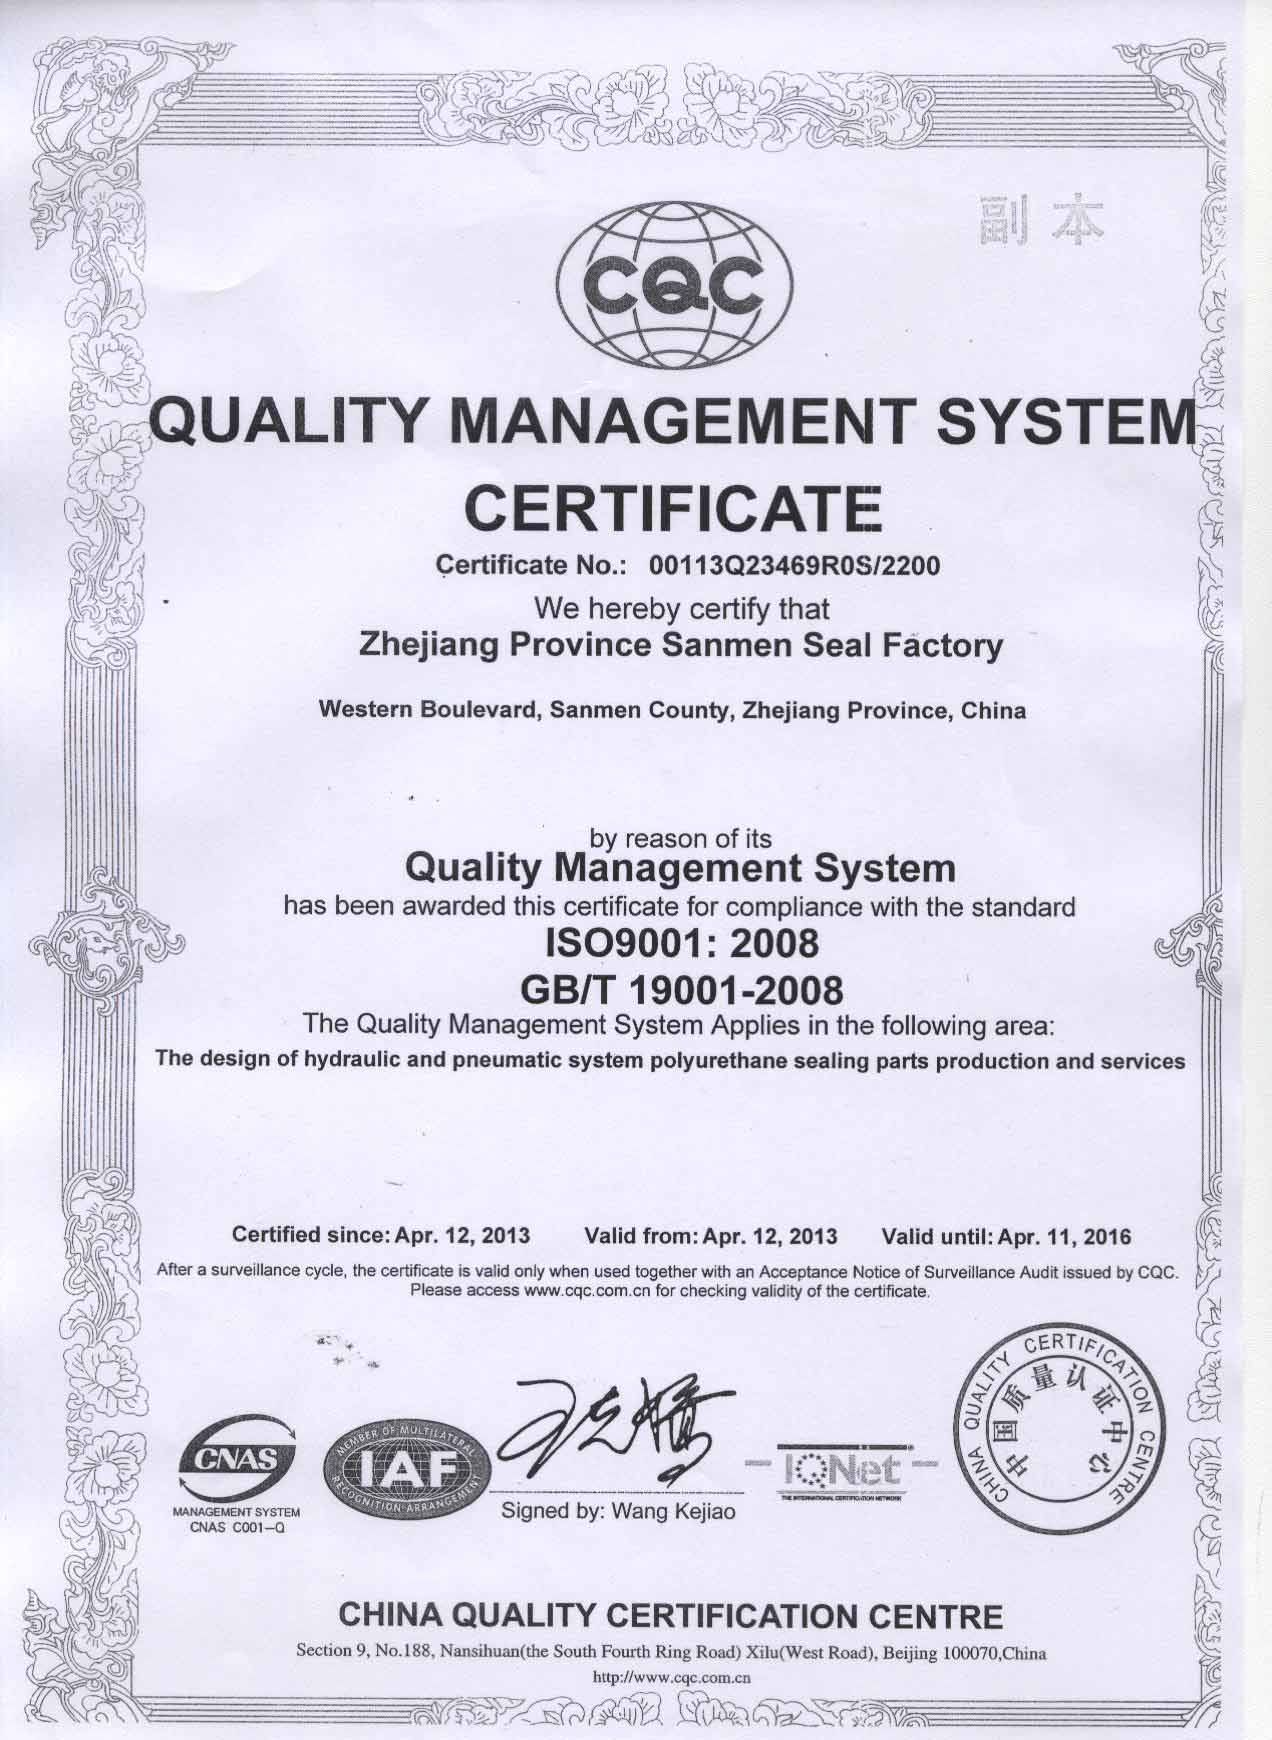 Certificates ISO9001:2008